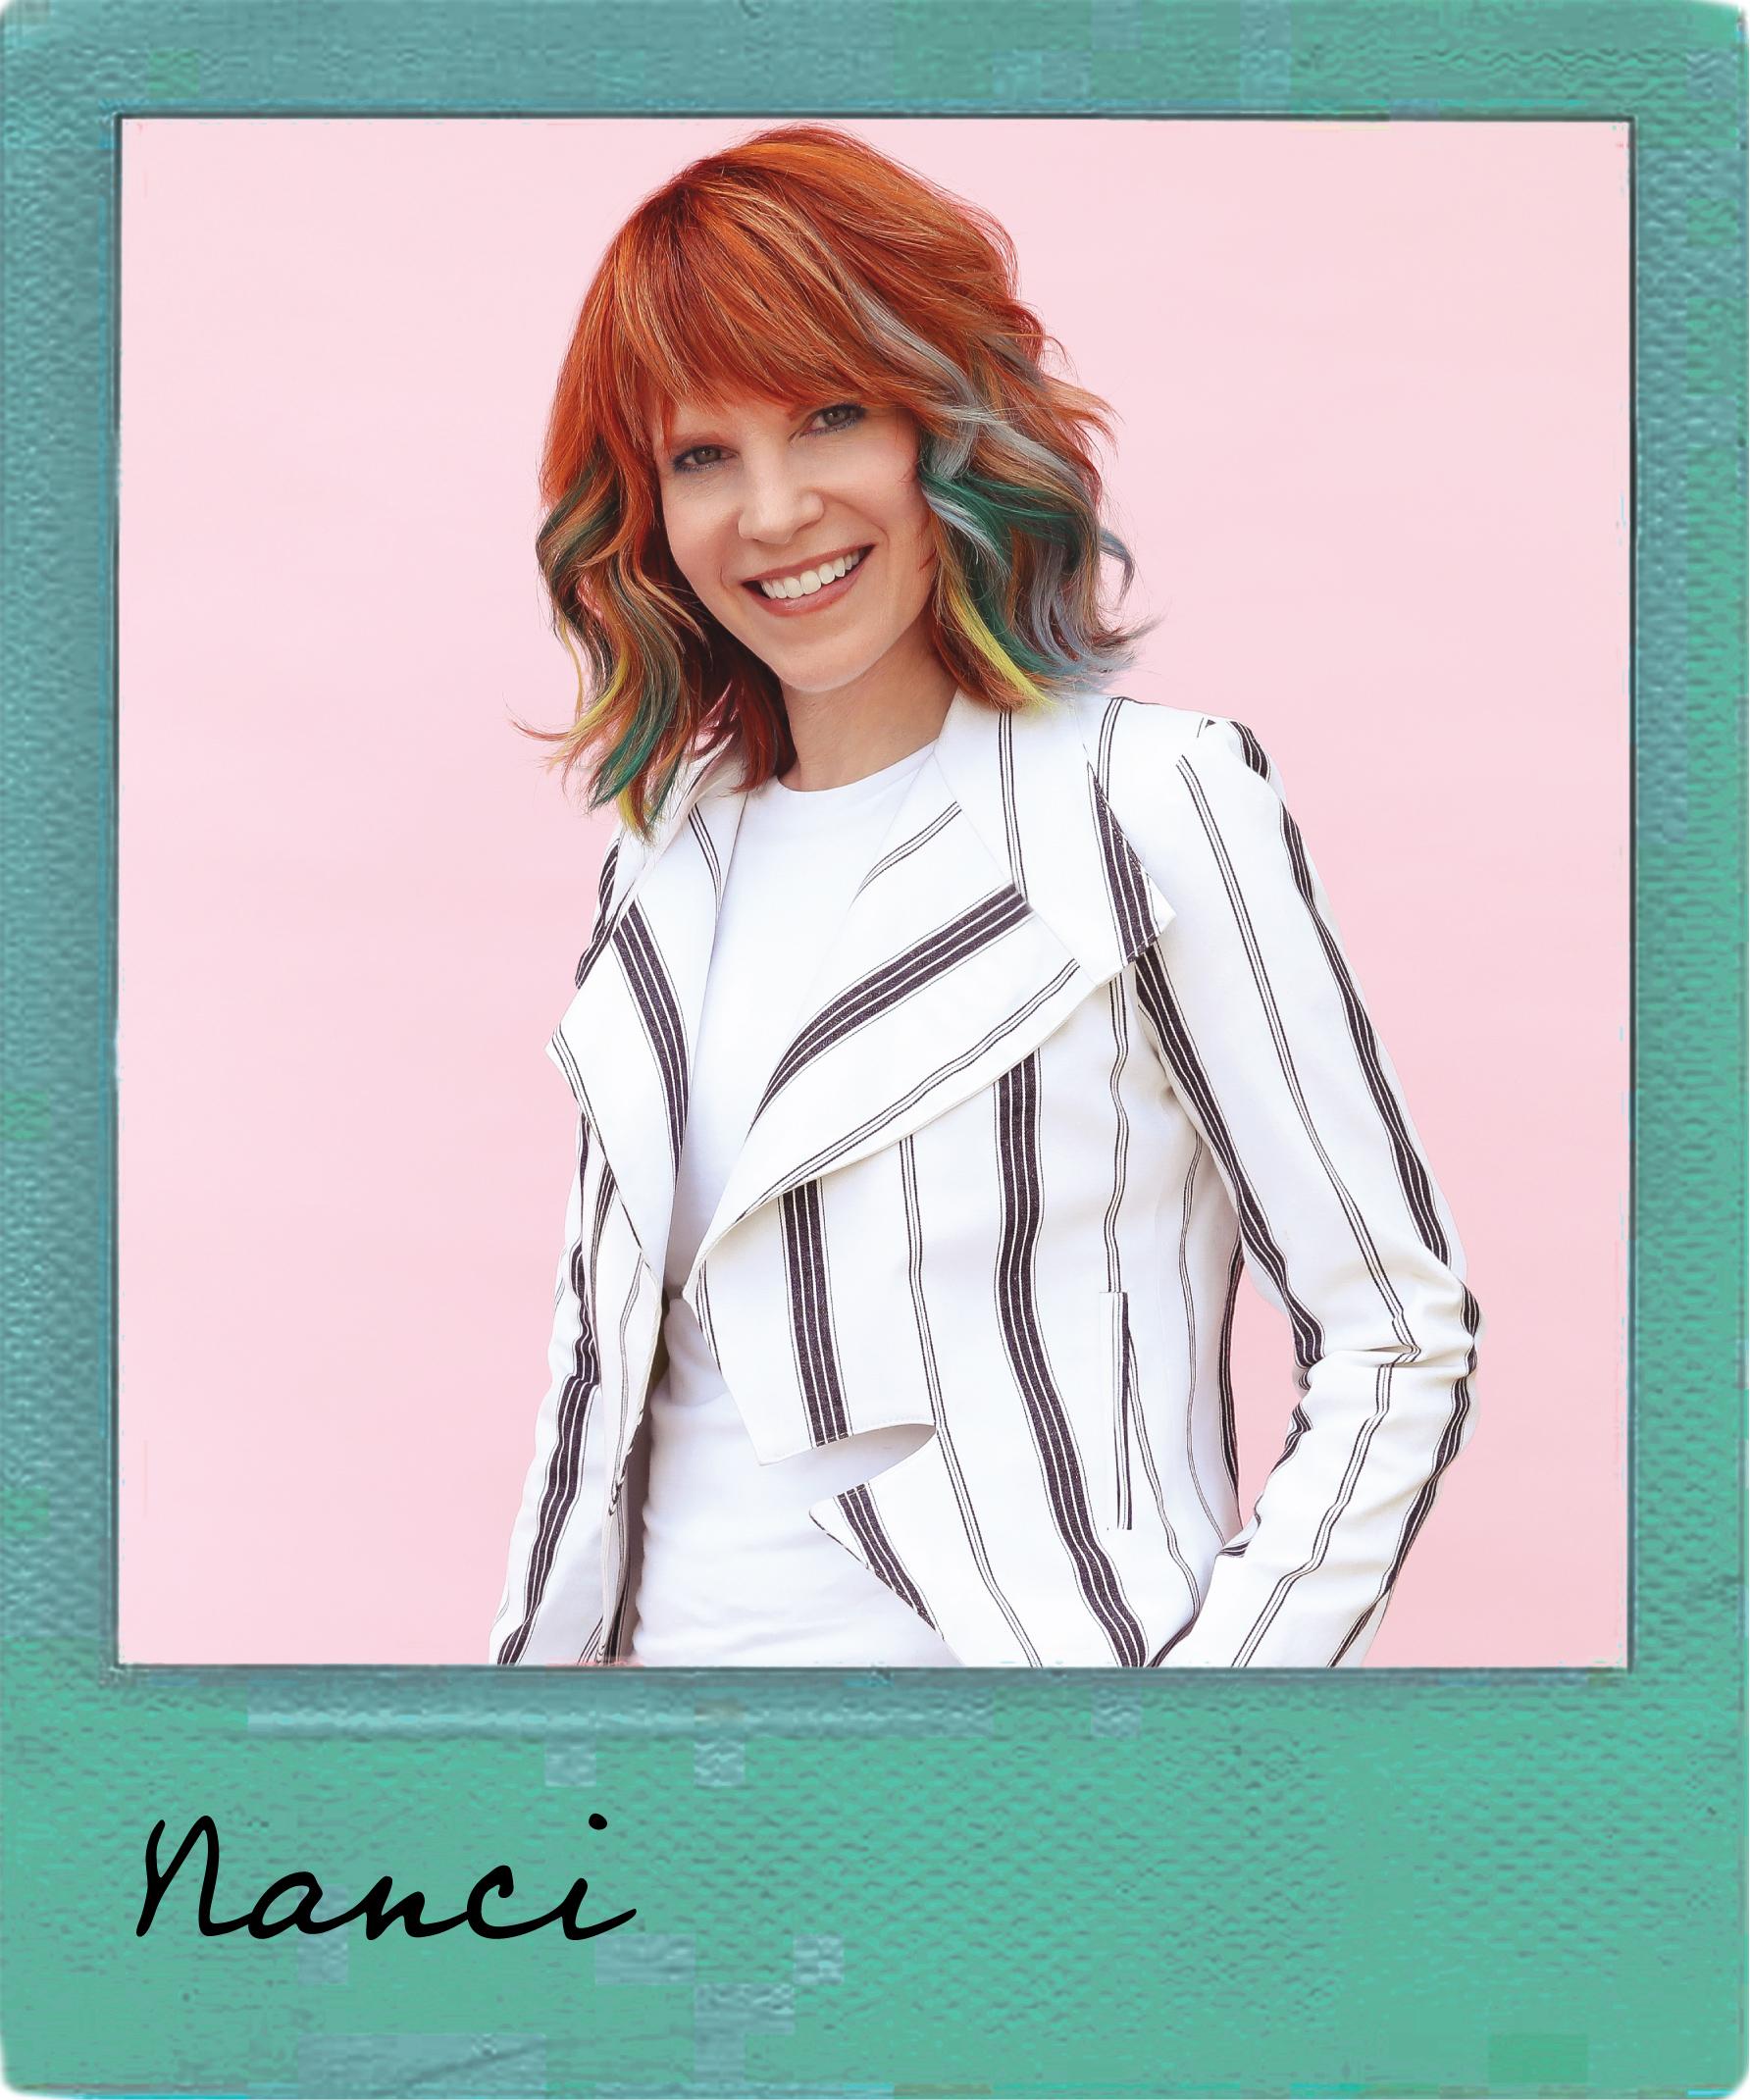 Nanci_Polaroid.jpg